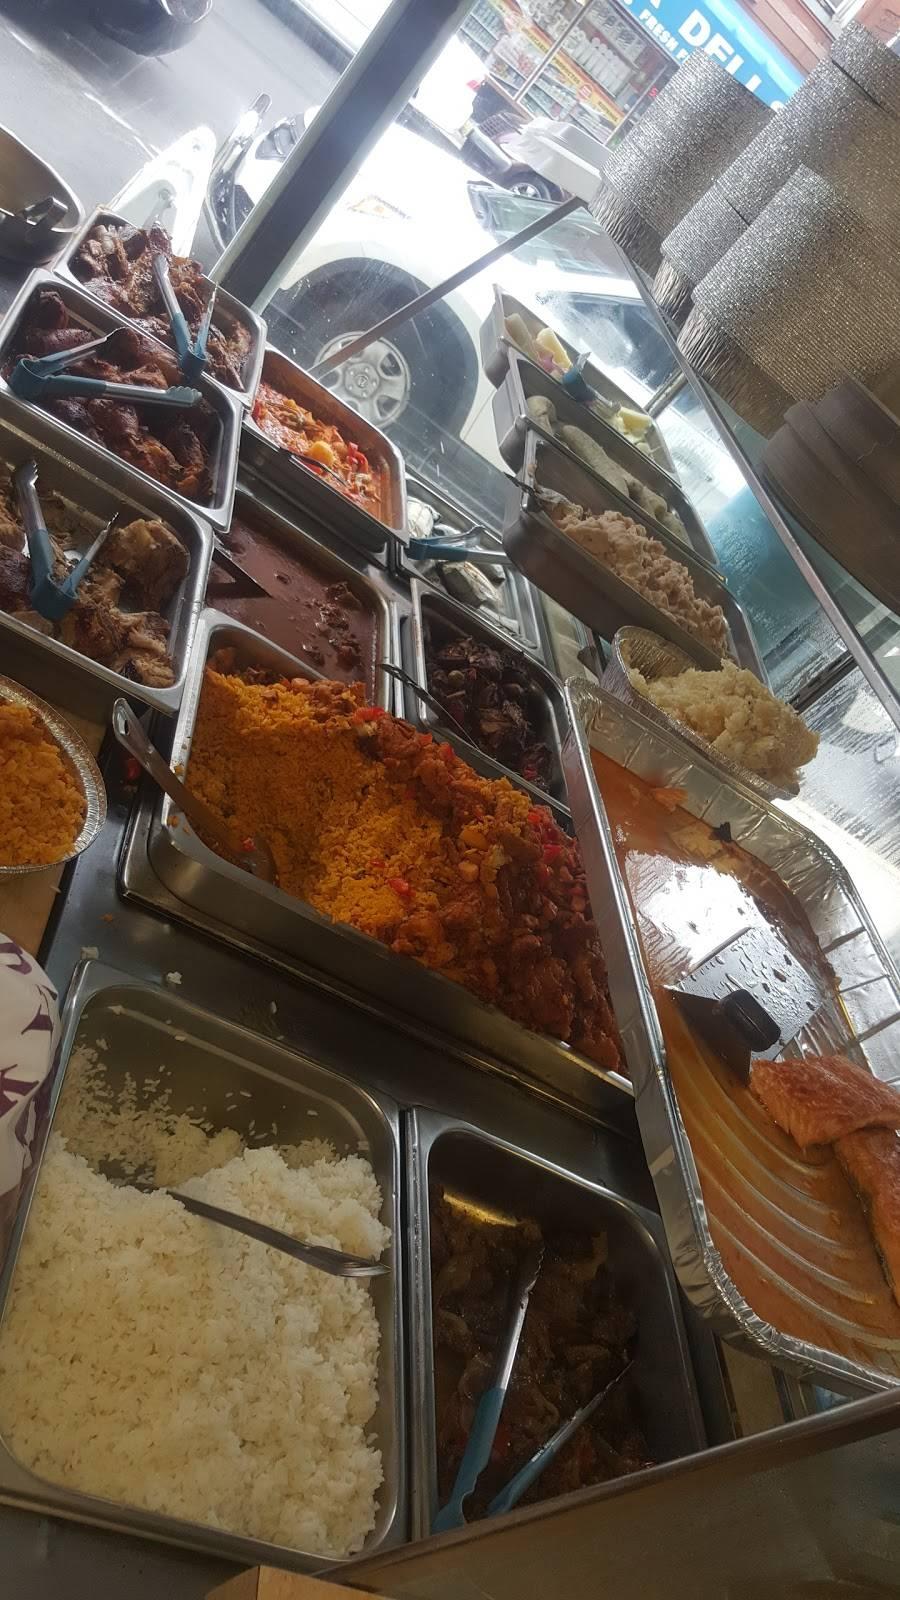 Hudson Fish Restaurant | restaurant | 5809 Hudson Ave, West New York, NJ 07093, USA | 2017587482 OR +1 201-758-7482